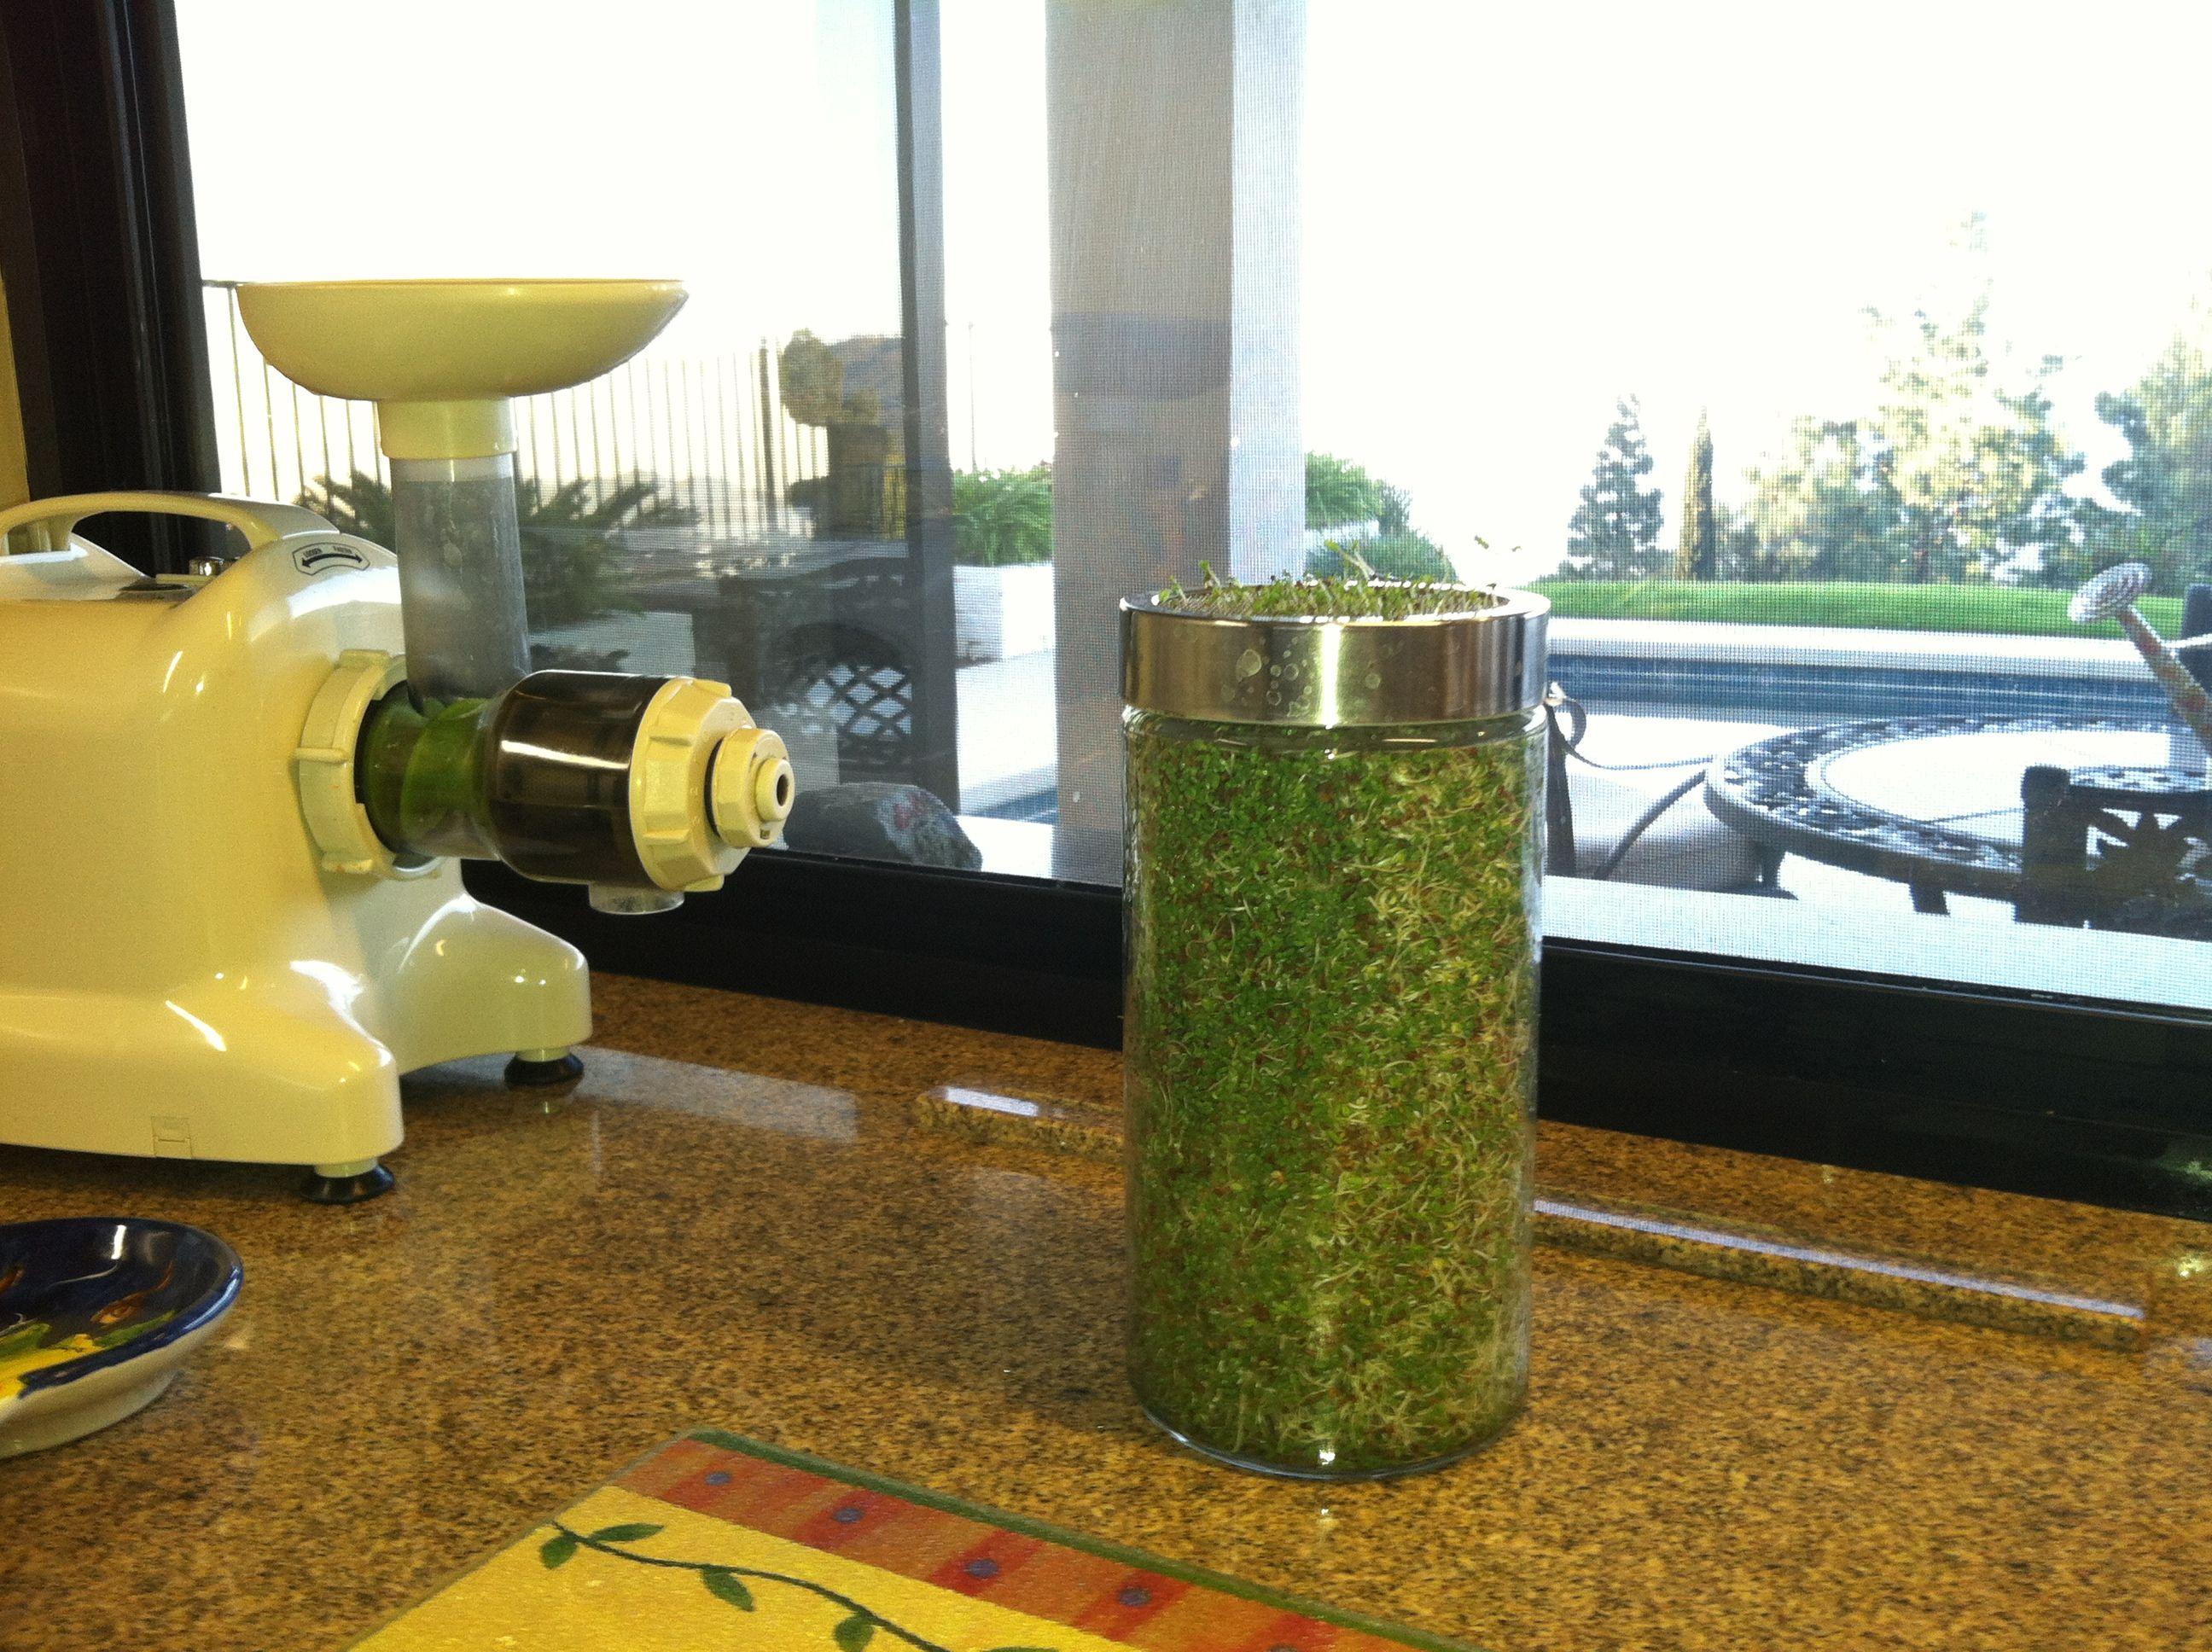 Alfalfa sprouts alfalfa sprouts coffee maker french press